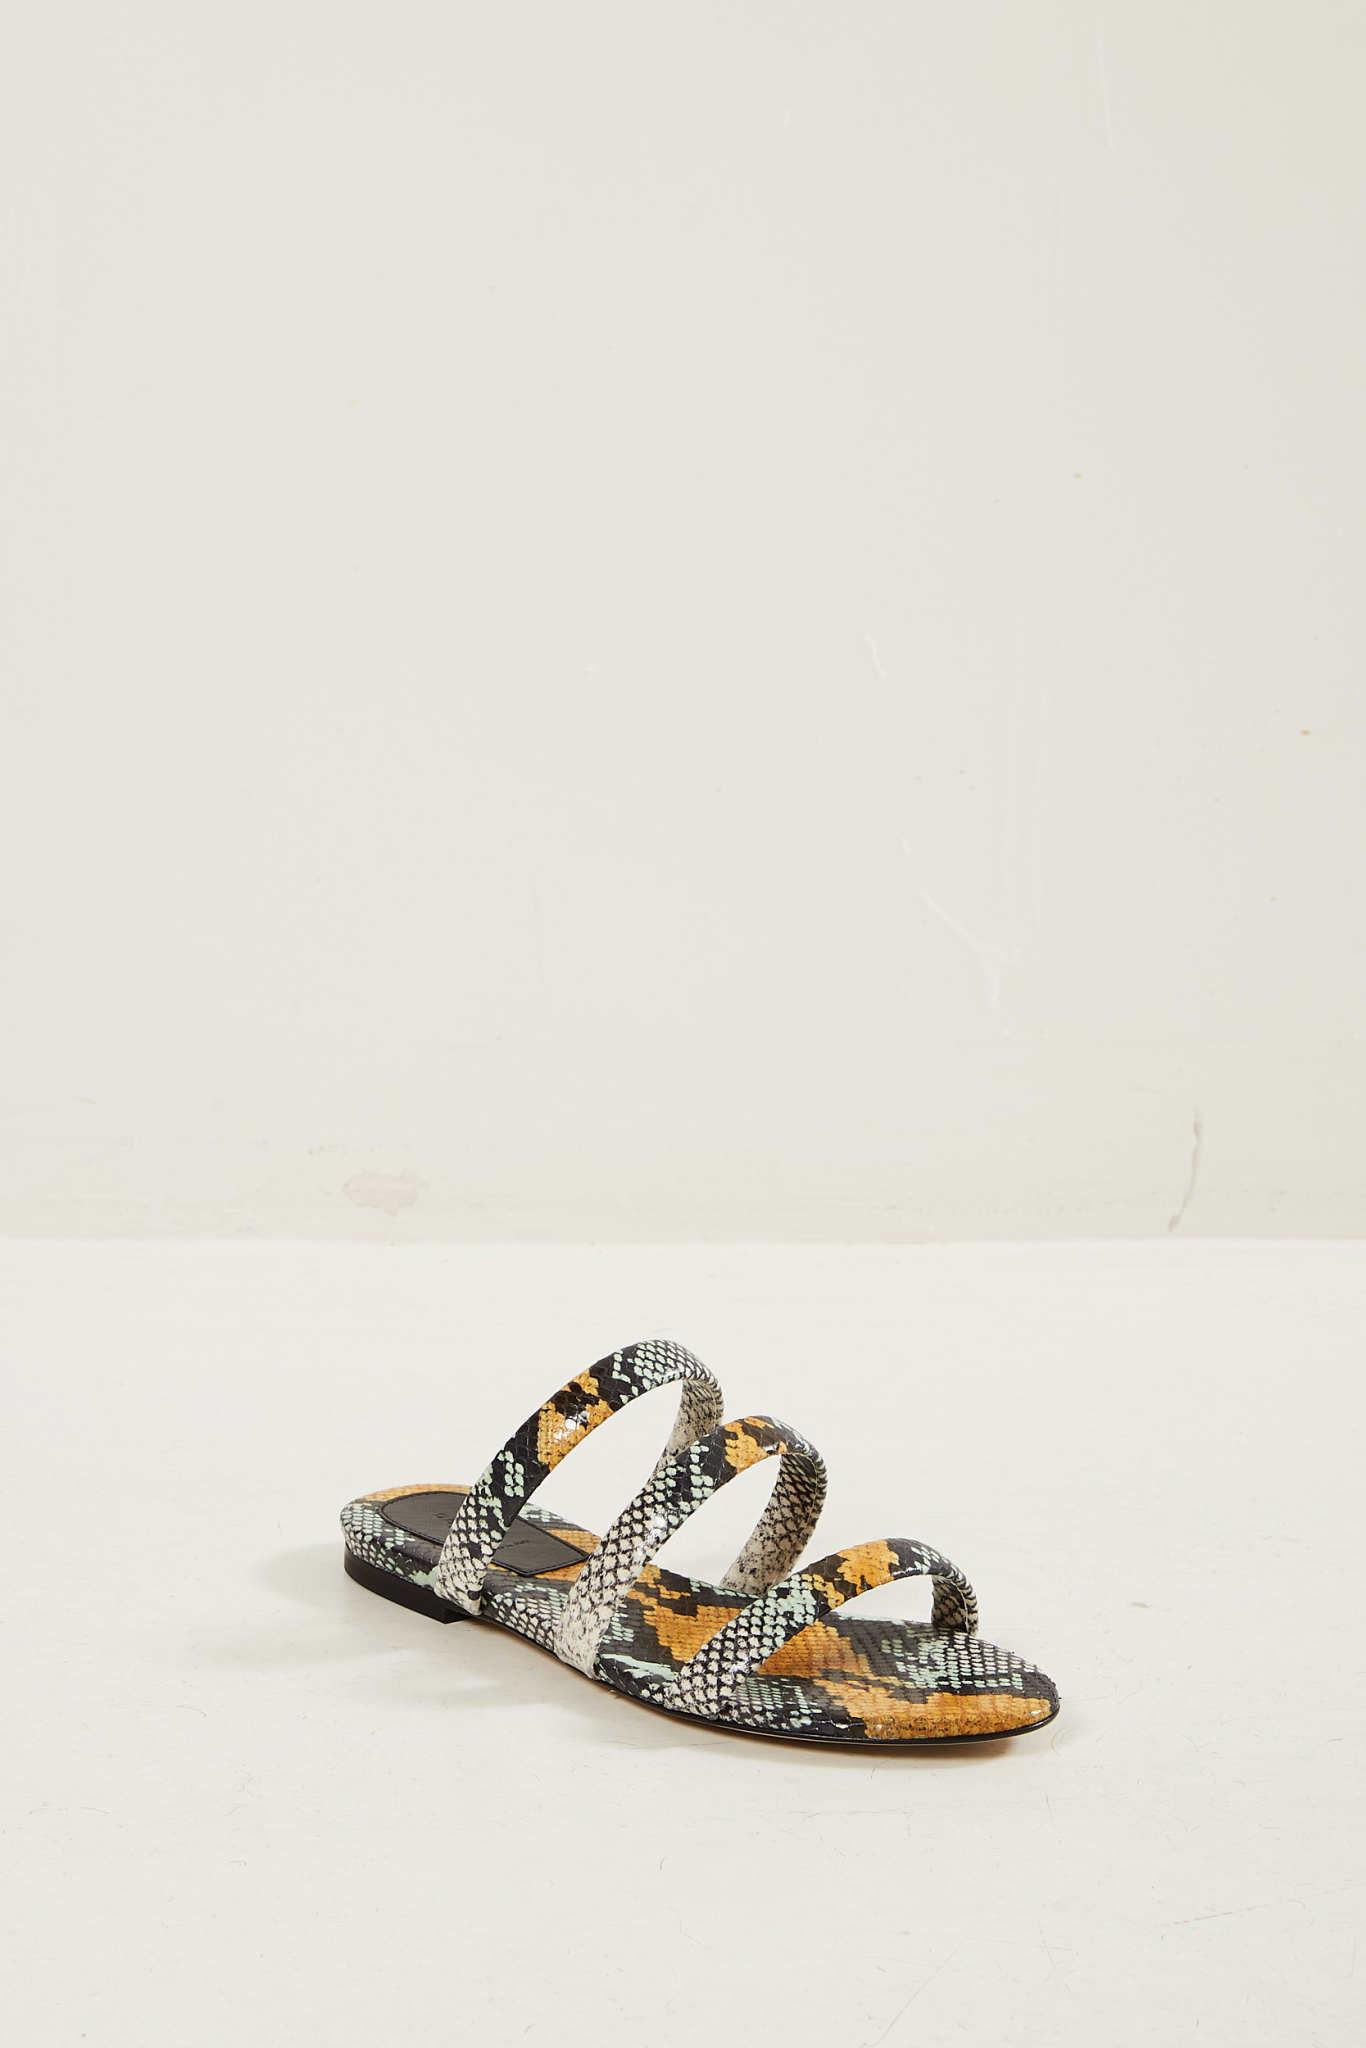 Aeyde Chrissy snake print sandals.